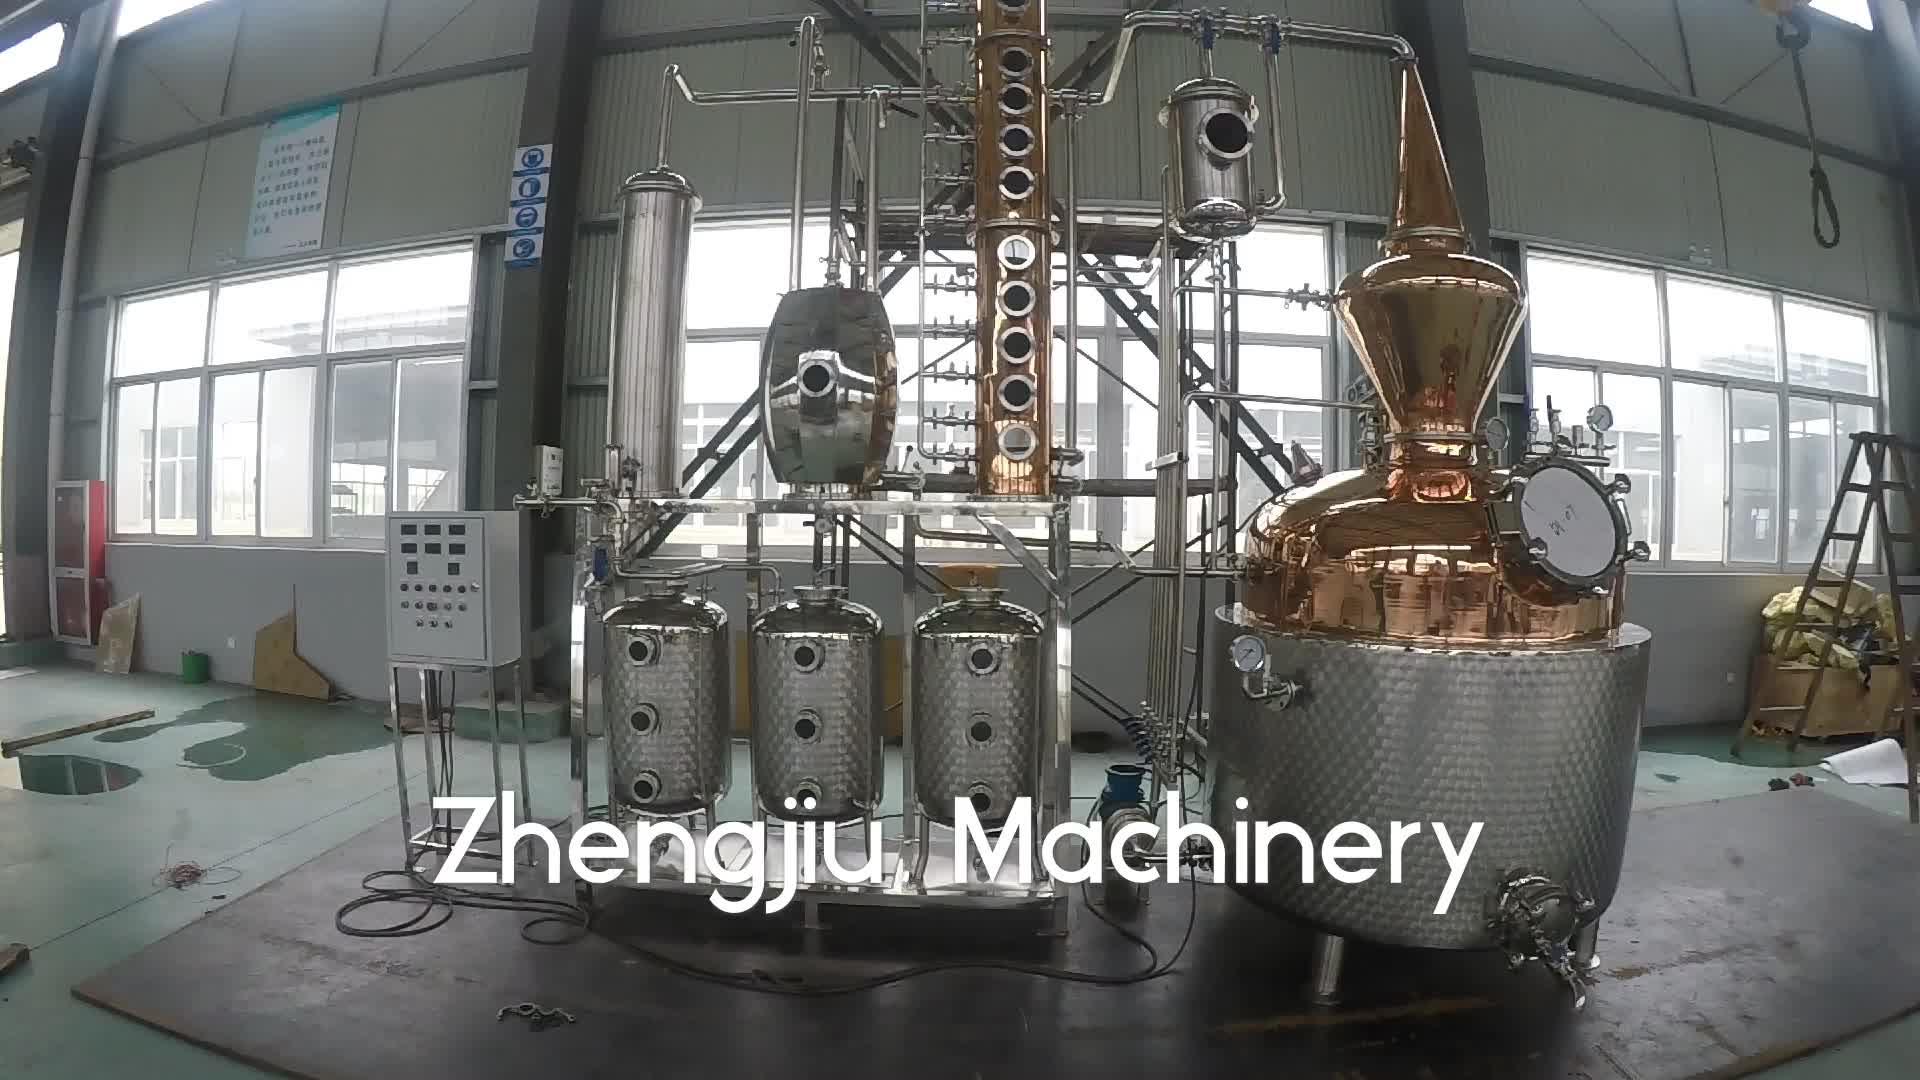 शराब आसवन उपकरण जिन अभी भी आसवनी संयंत्र ginebra destilacion